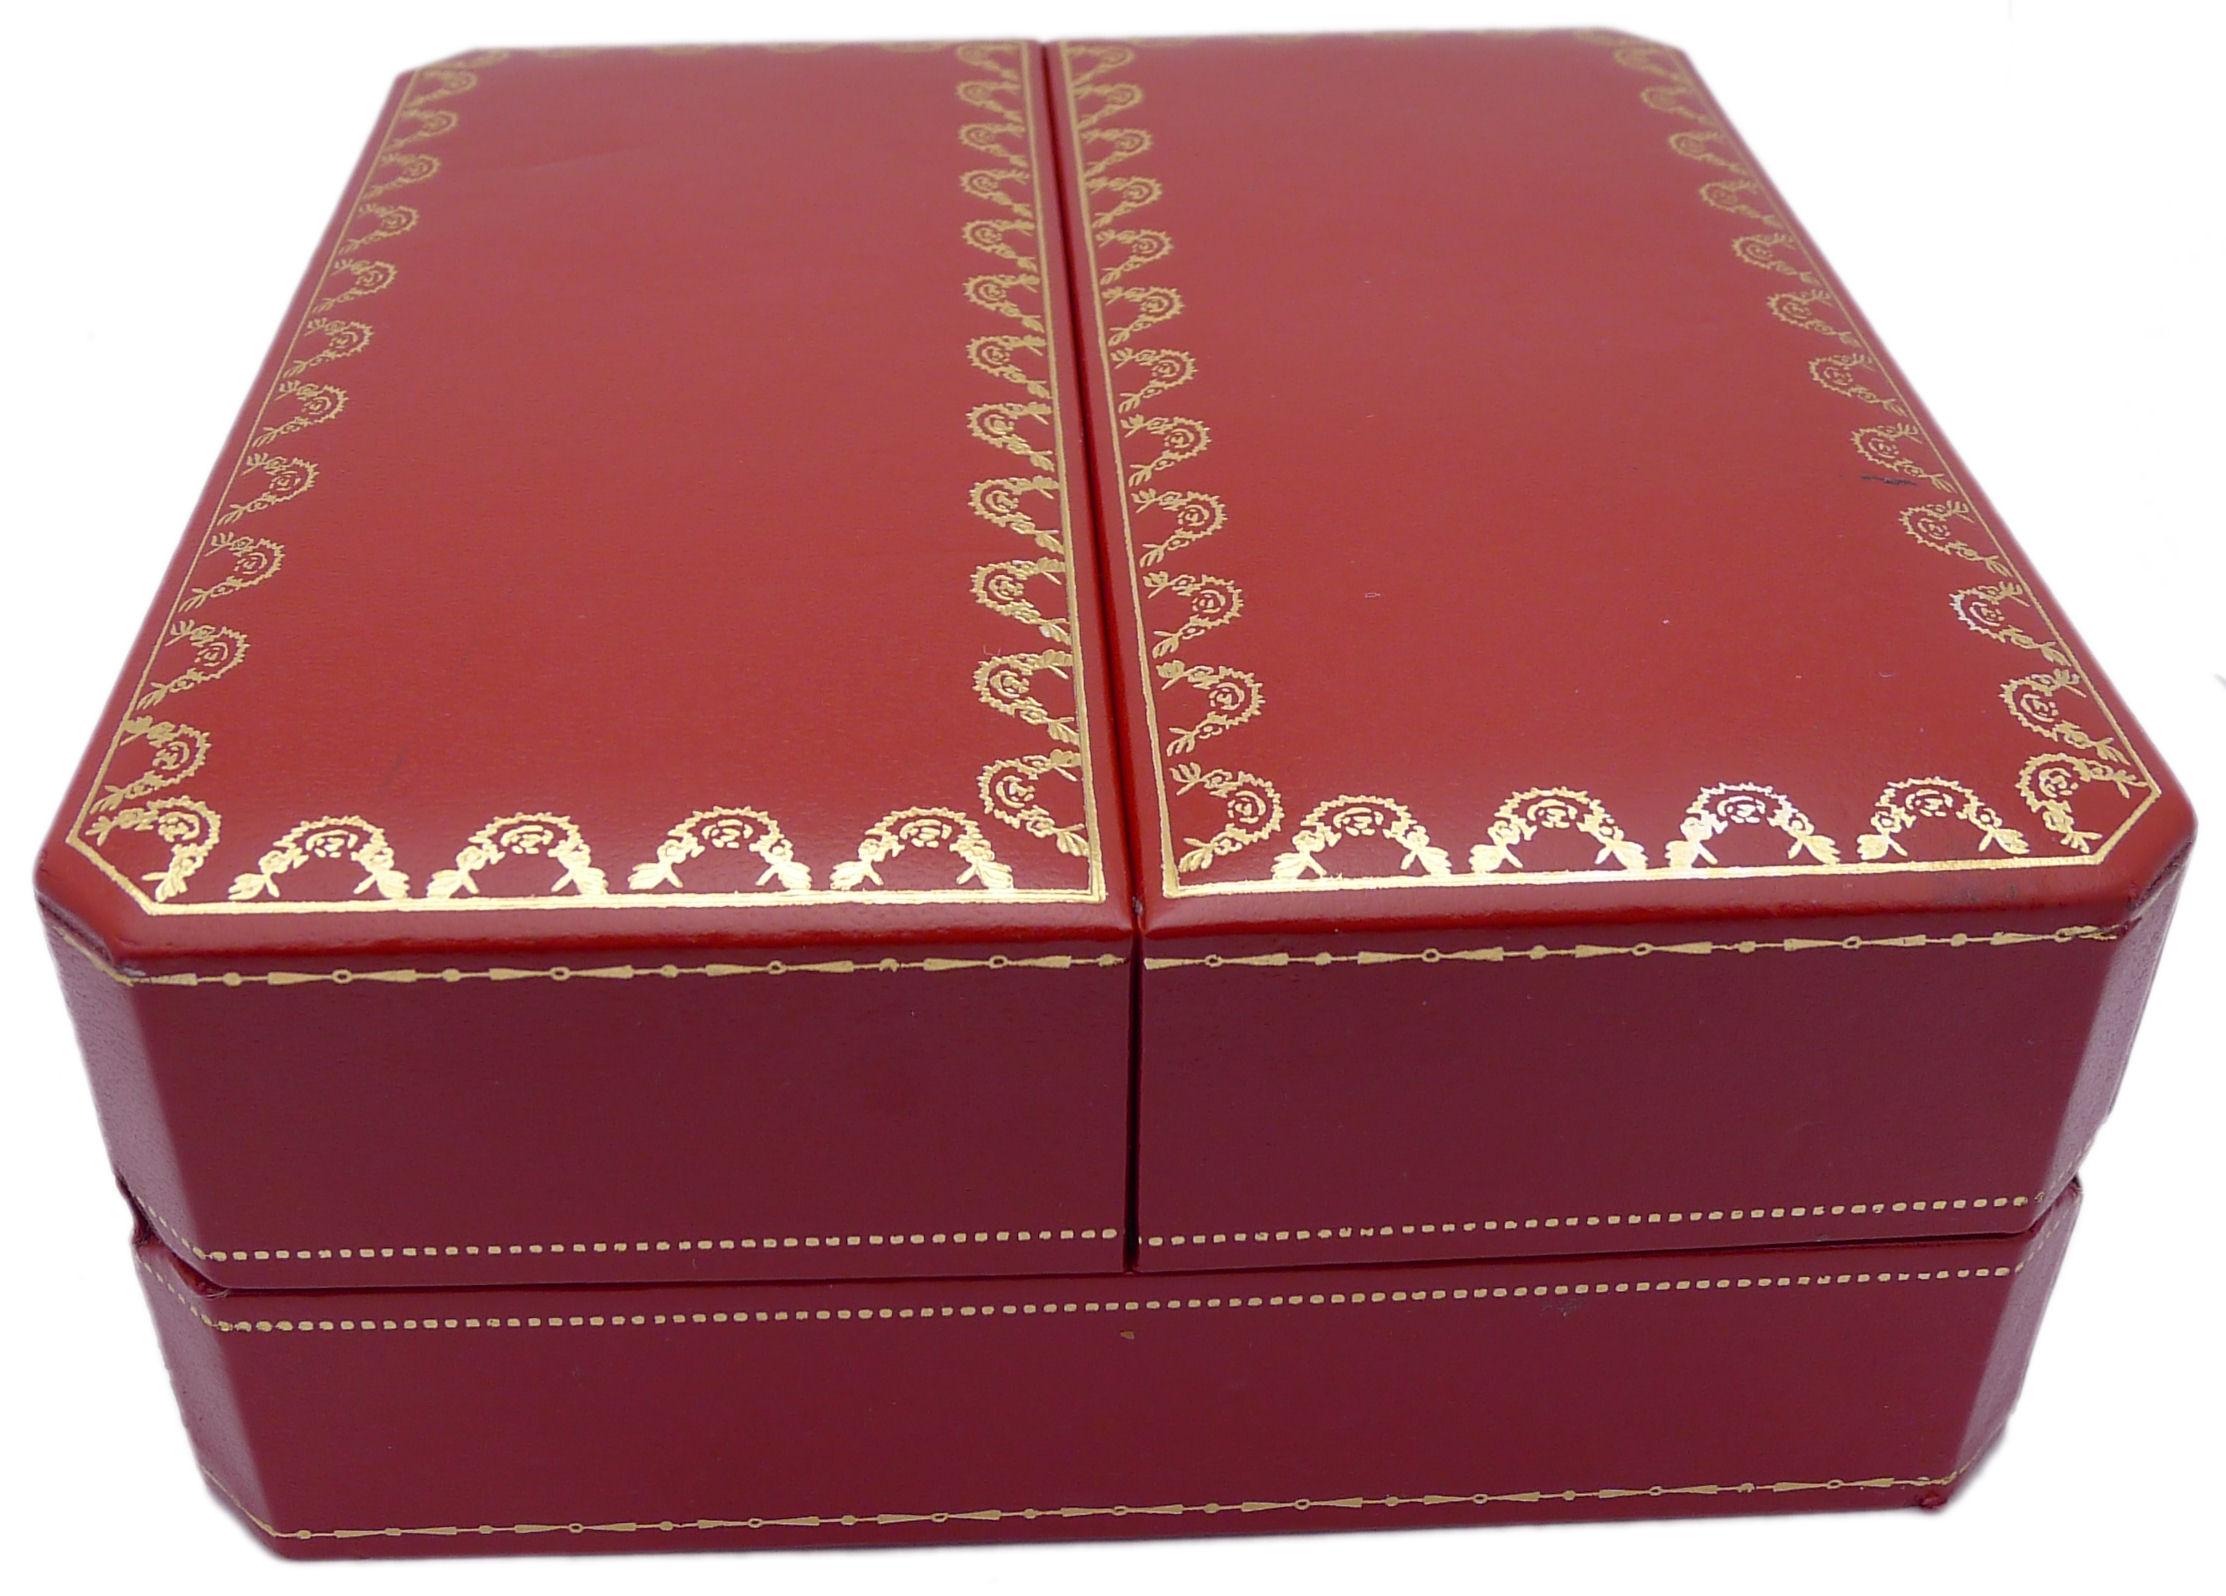 cartier box f r armbanduhren aus den 90er jahren f r. Black Bedroom Furniture Sets. Home Design Ideas